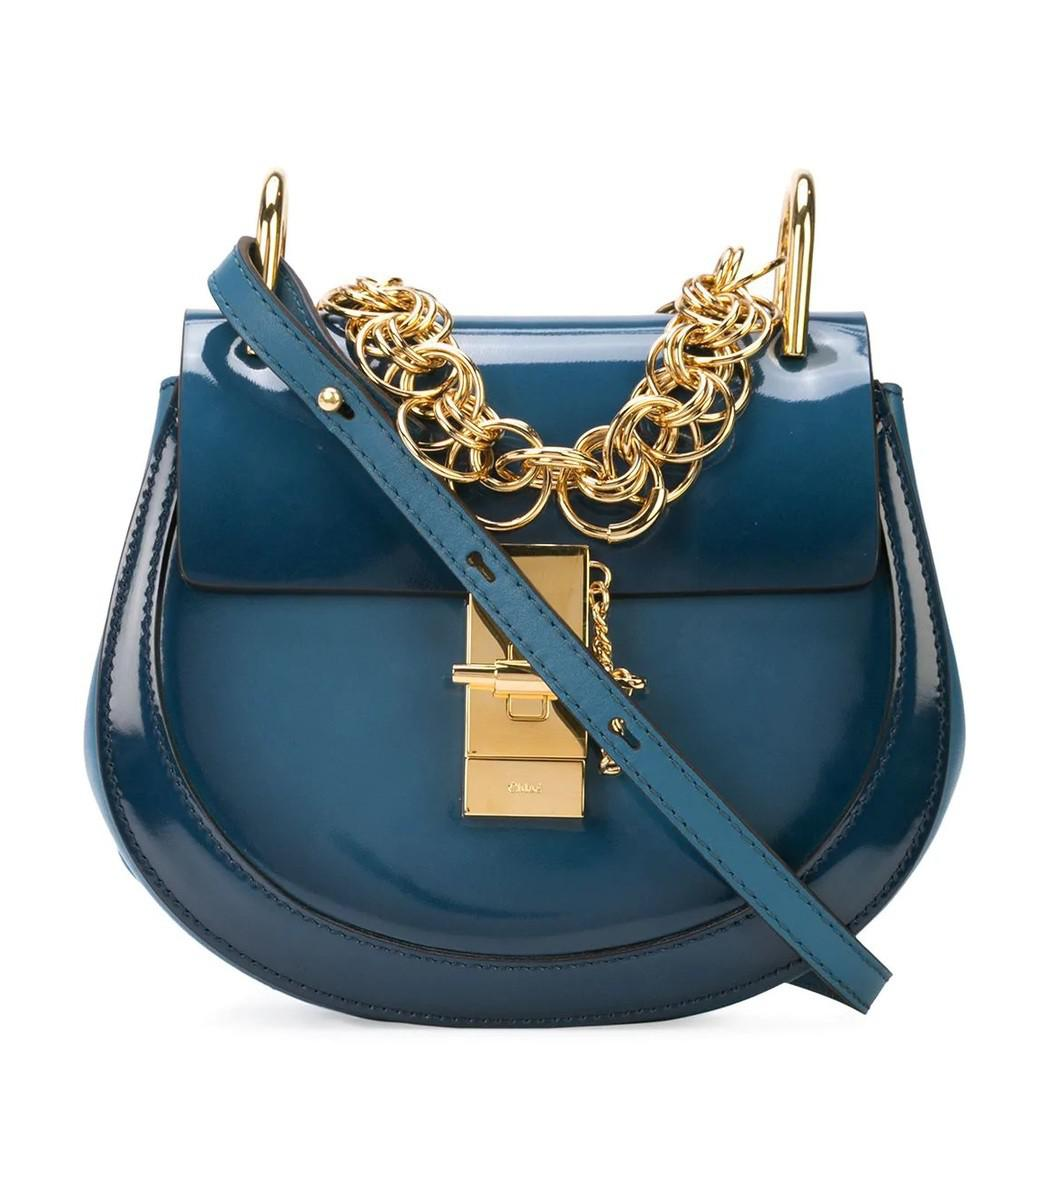 0063006d2 Chloé Blue Patent Leather Drew Bijou Bag in Blue - Lyst